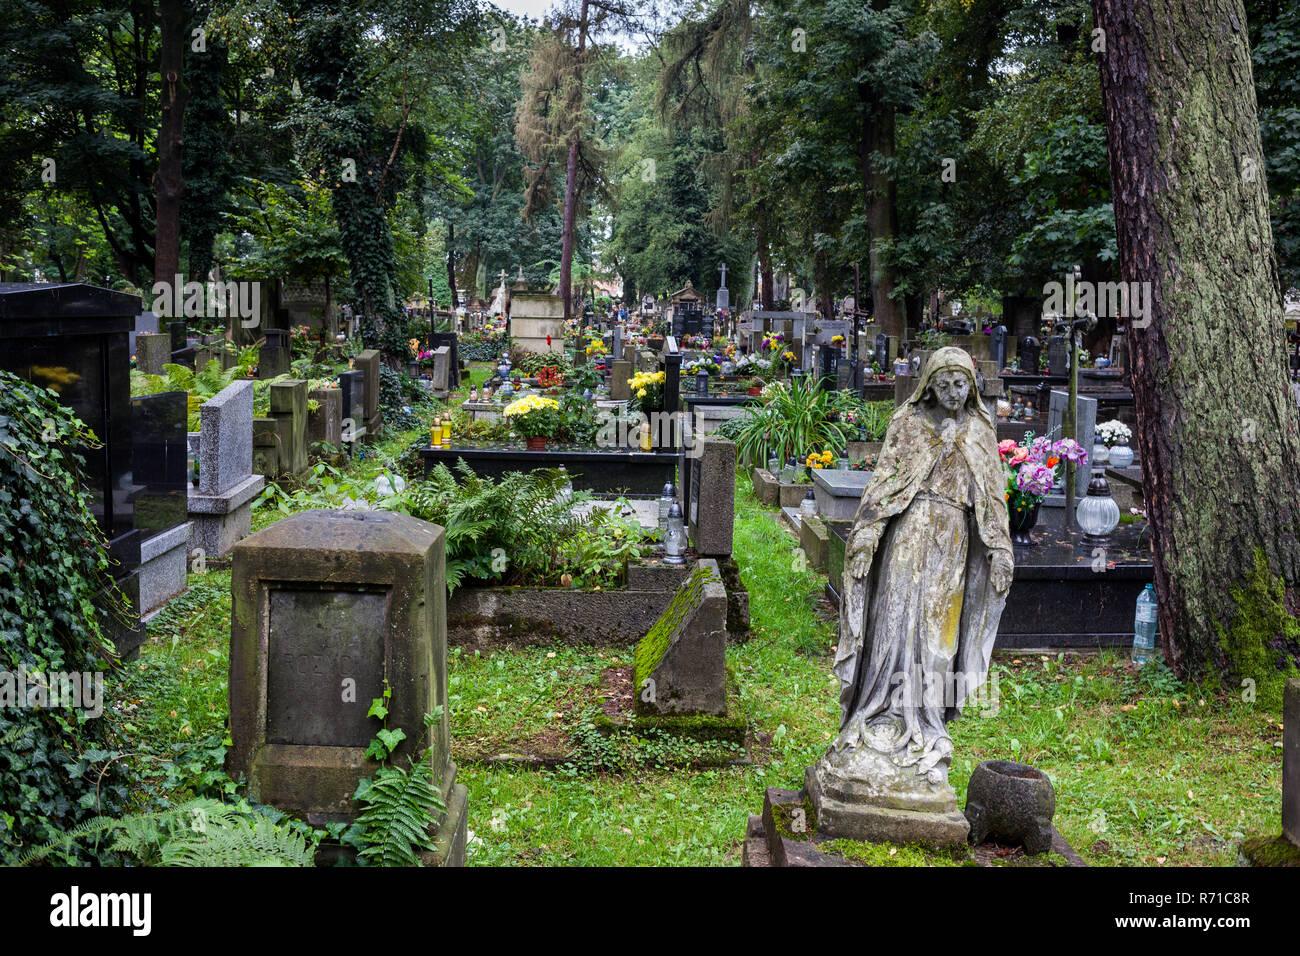 Rakowicki Cemetery (Polish: Cmentarz Rakowicki) in Krakow, Poland, 19th century necropolis - Stock Image